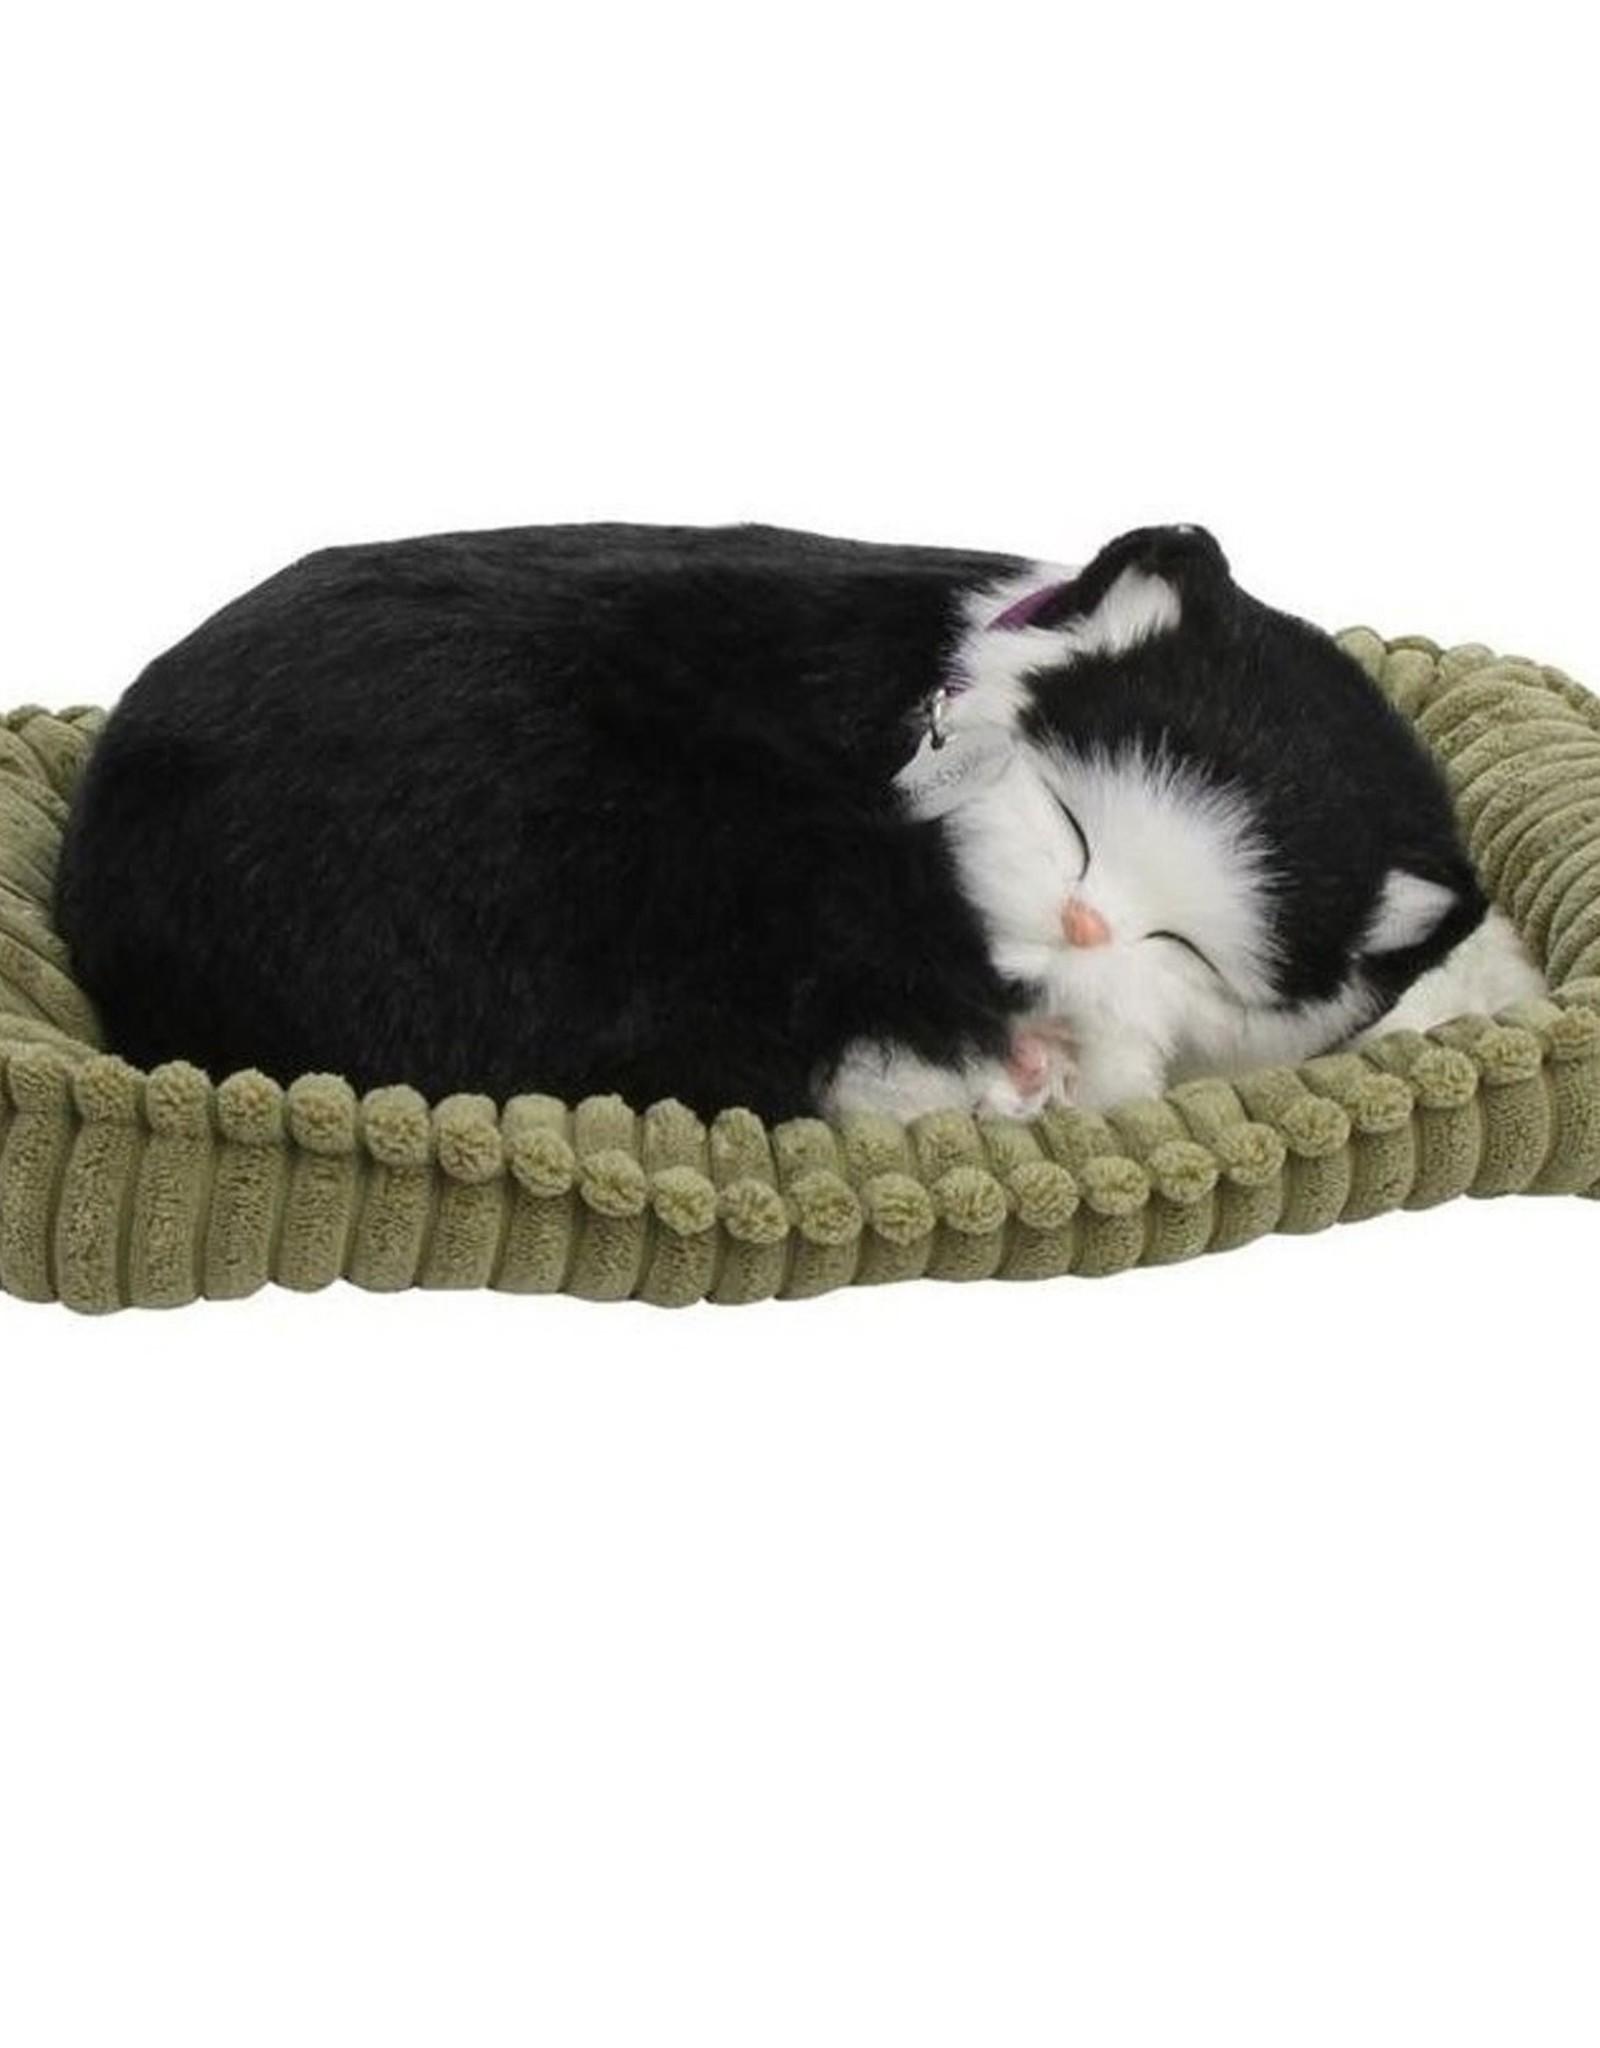 Perfect Petzzz Black & White cat